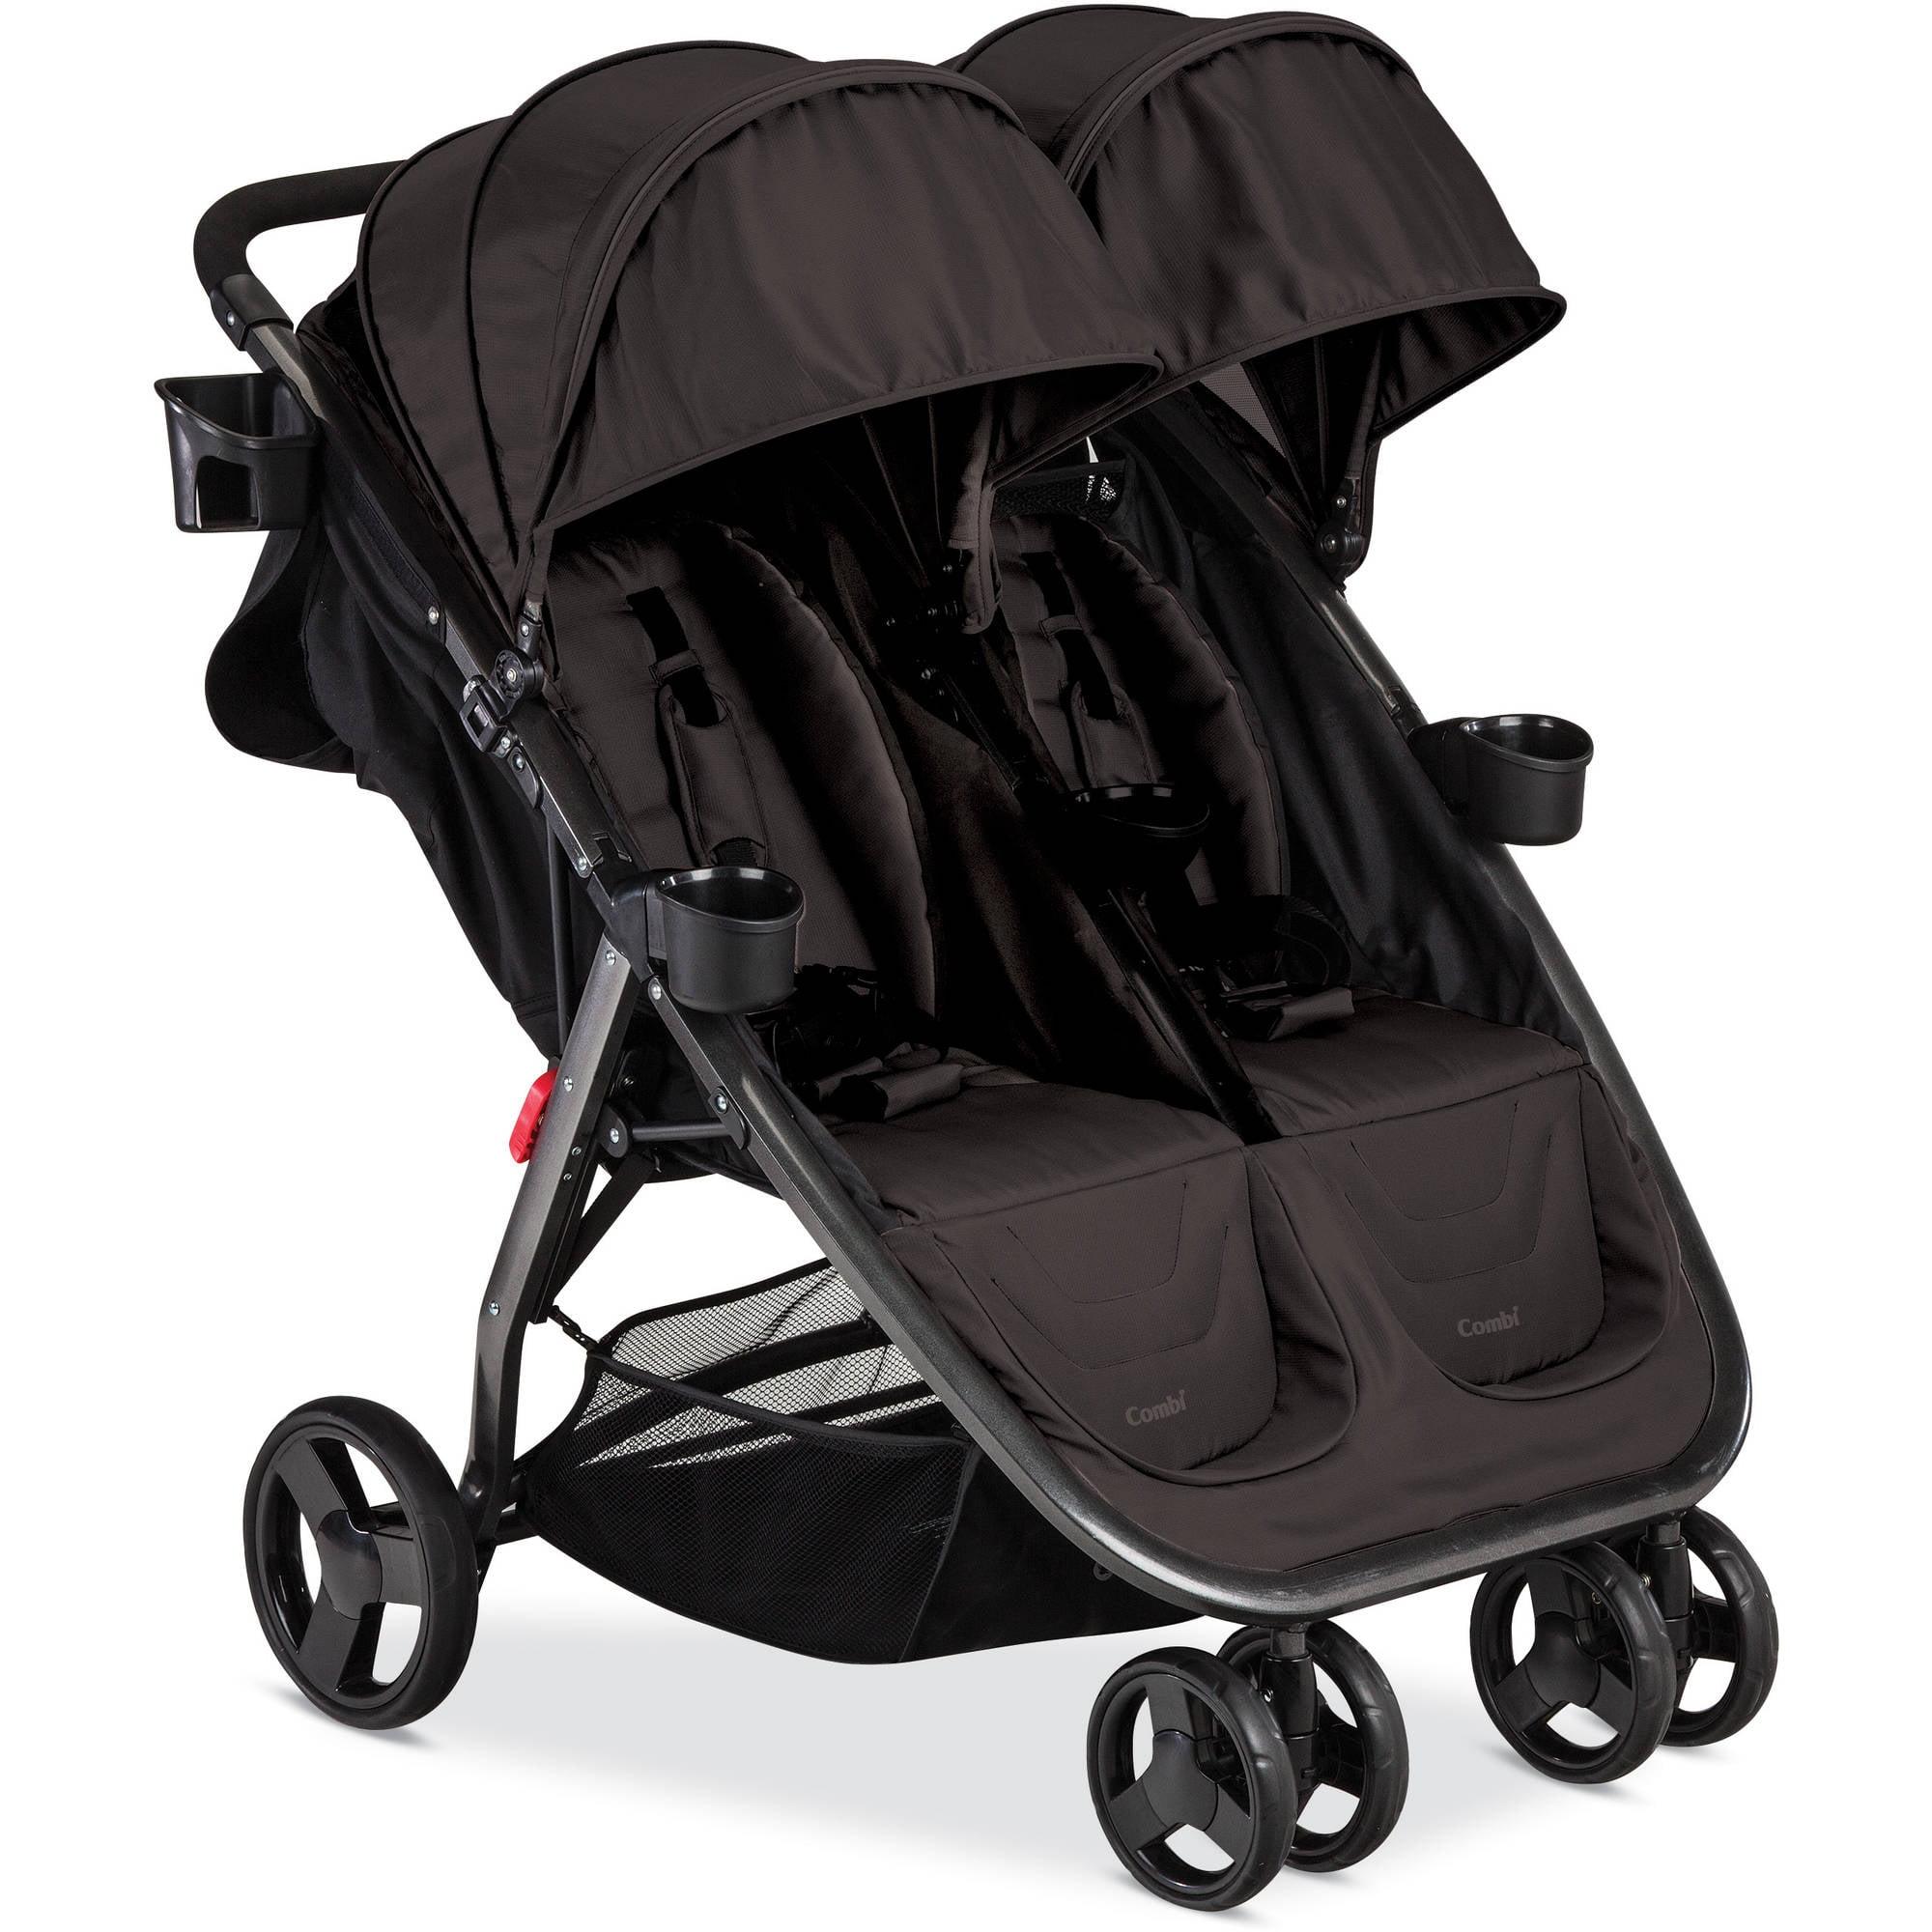 Supplier Generic Combi 2016 Fold N Go Double Stroller, Black